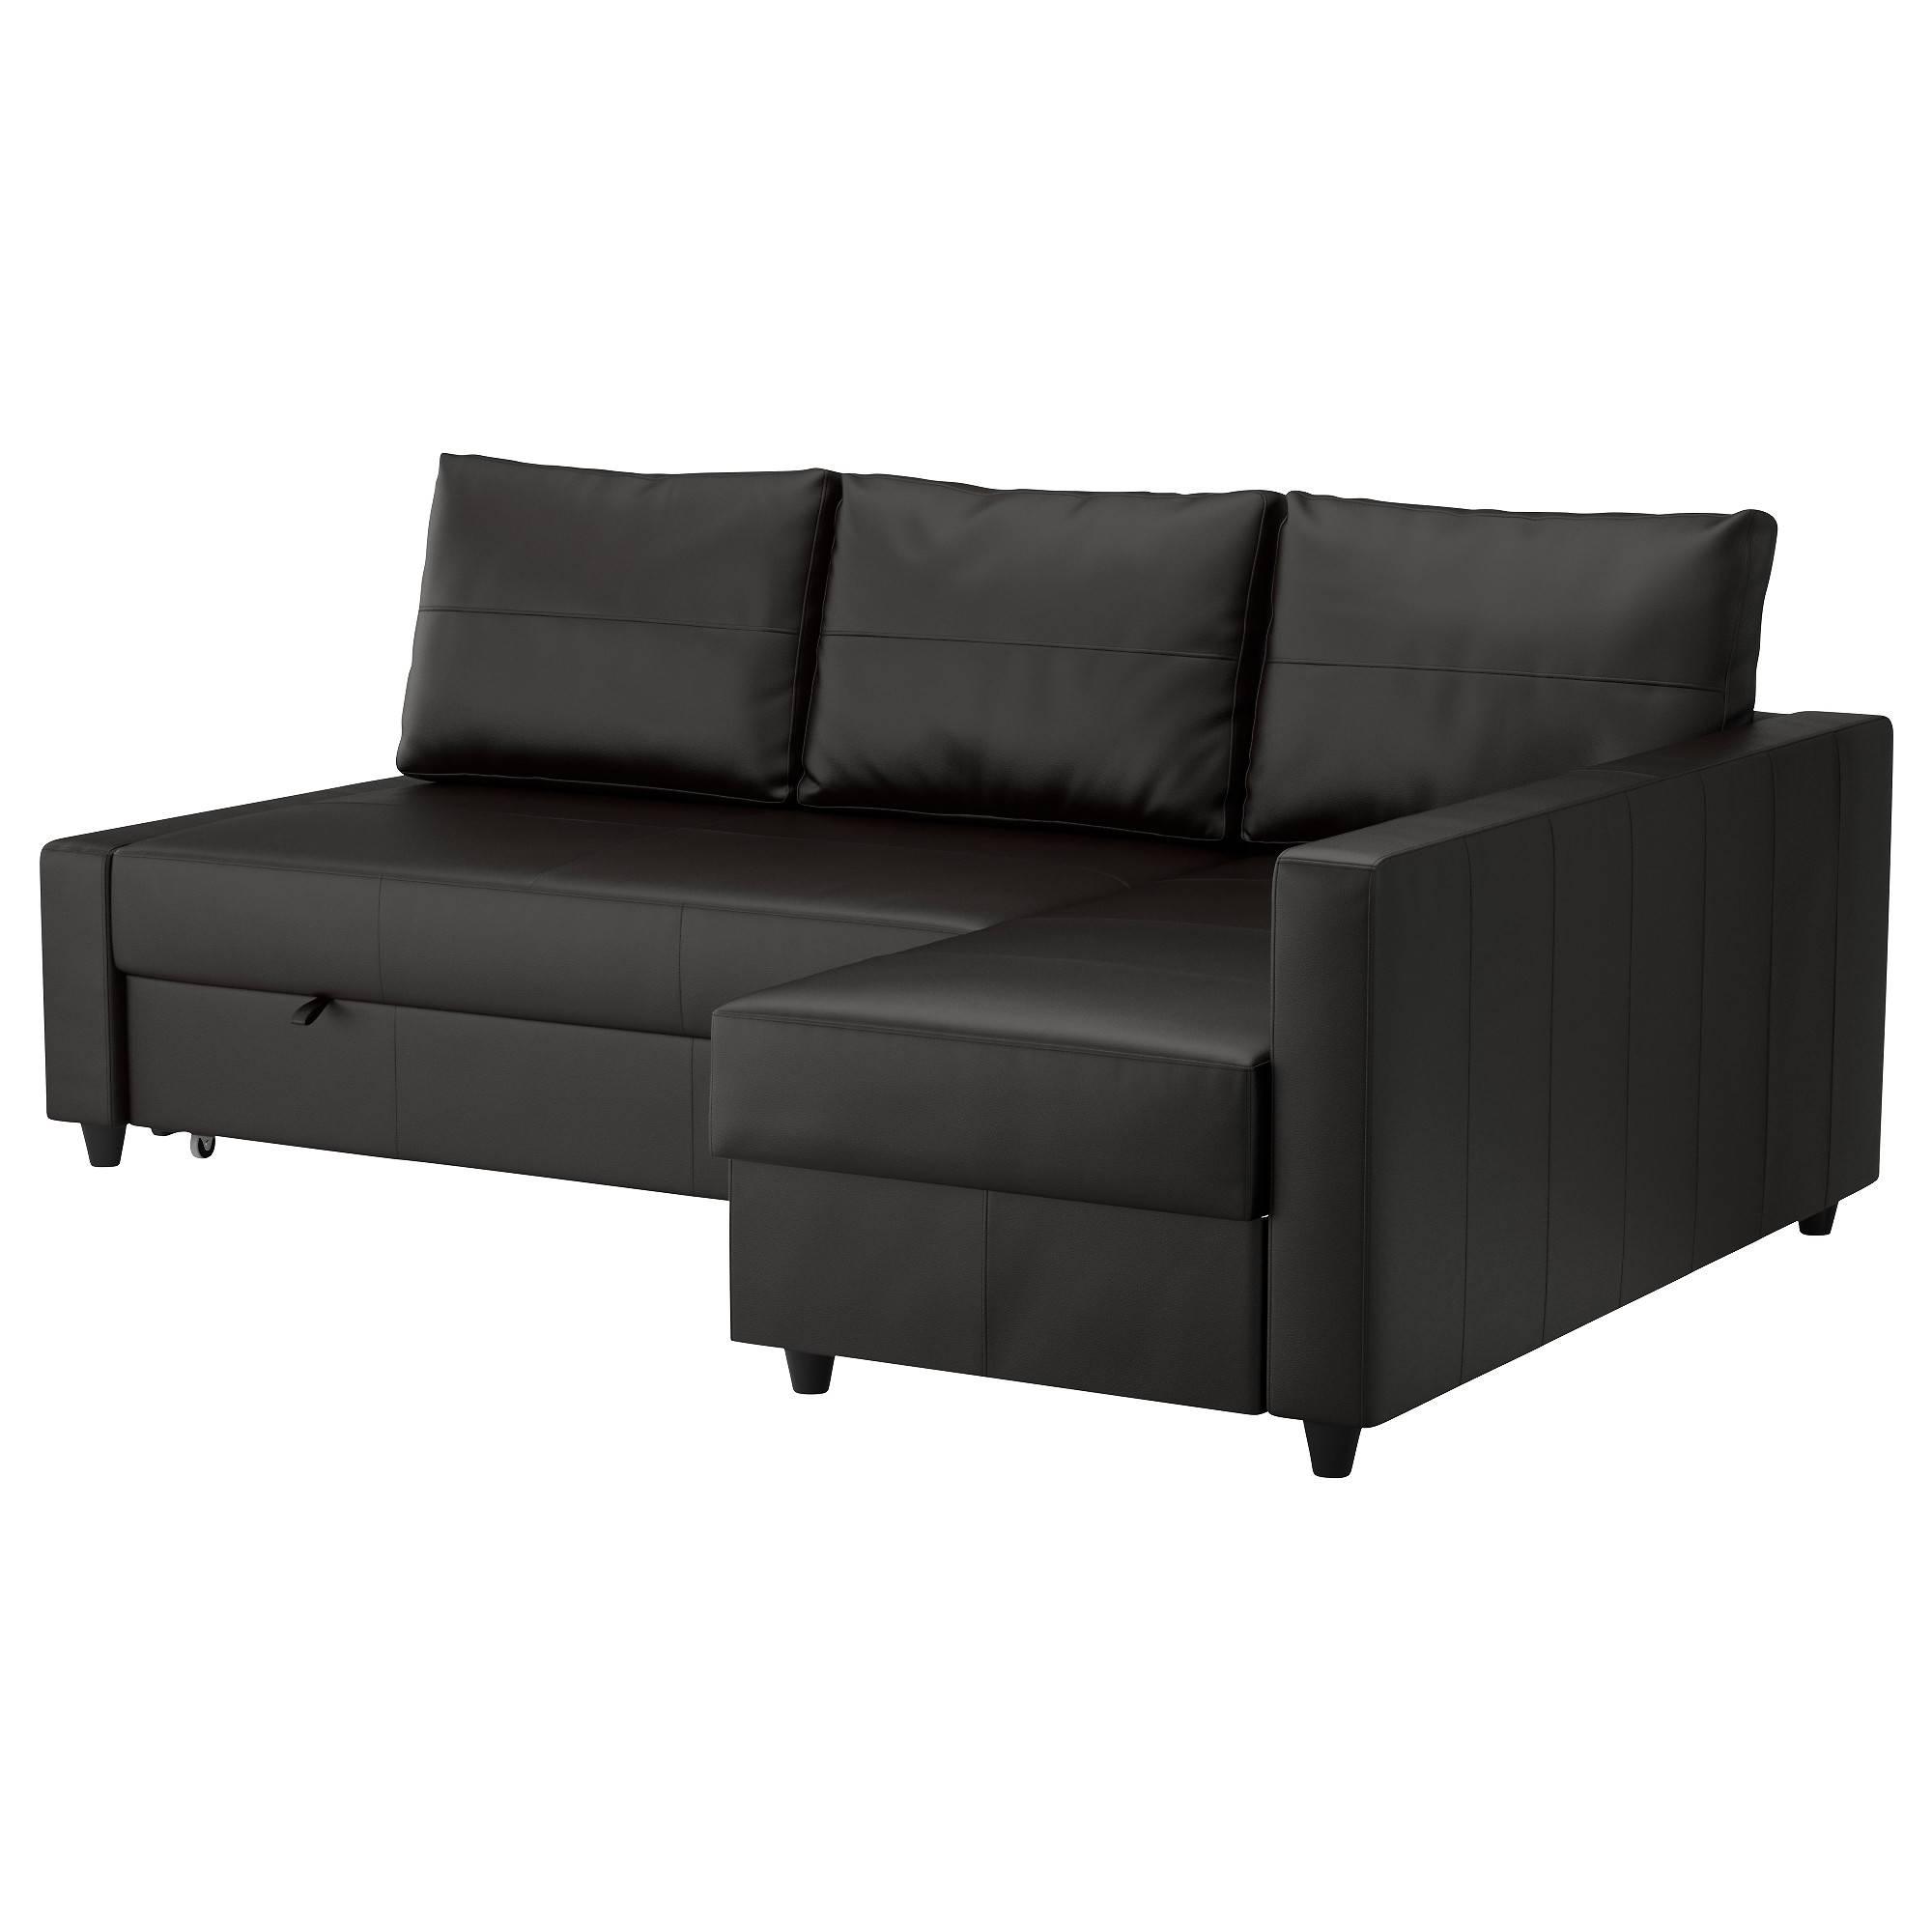 Friheten Corner Sofa-Bed With Storage Bomstad Black - Ikea inside Corner Sofa Bed With Storage Ikea (Image 9 of 30)